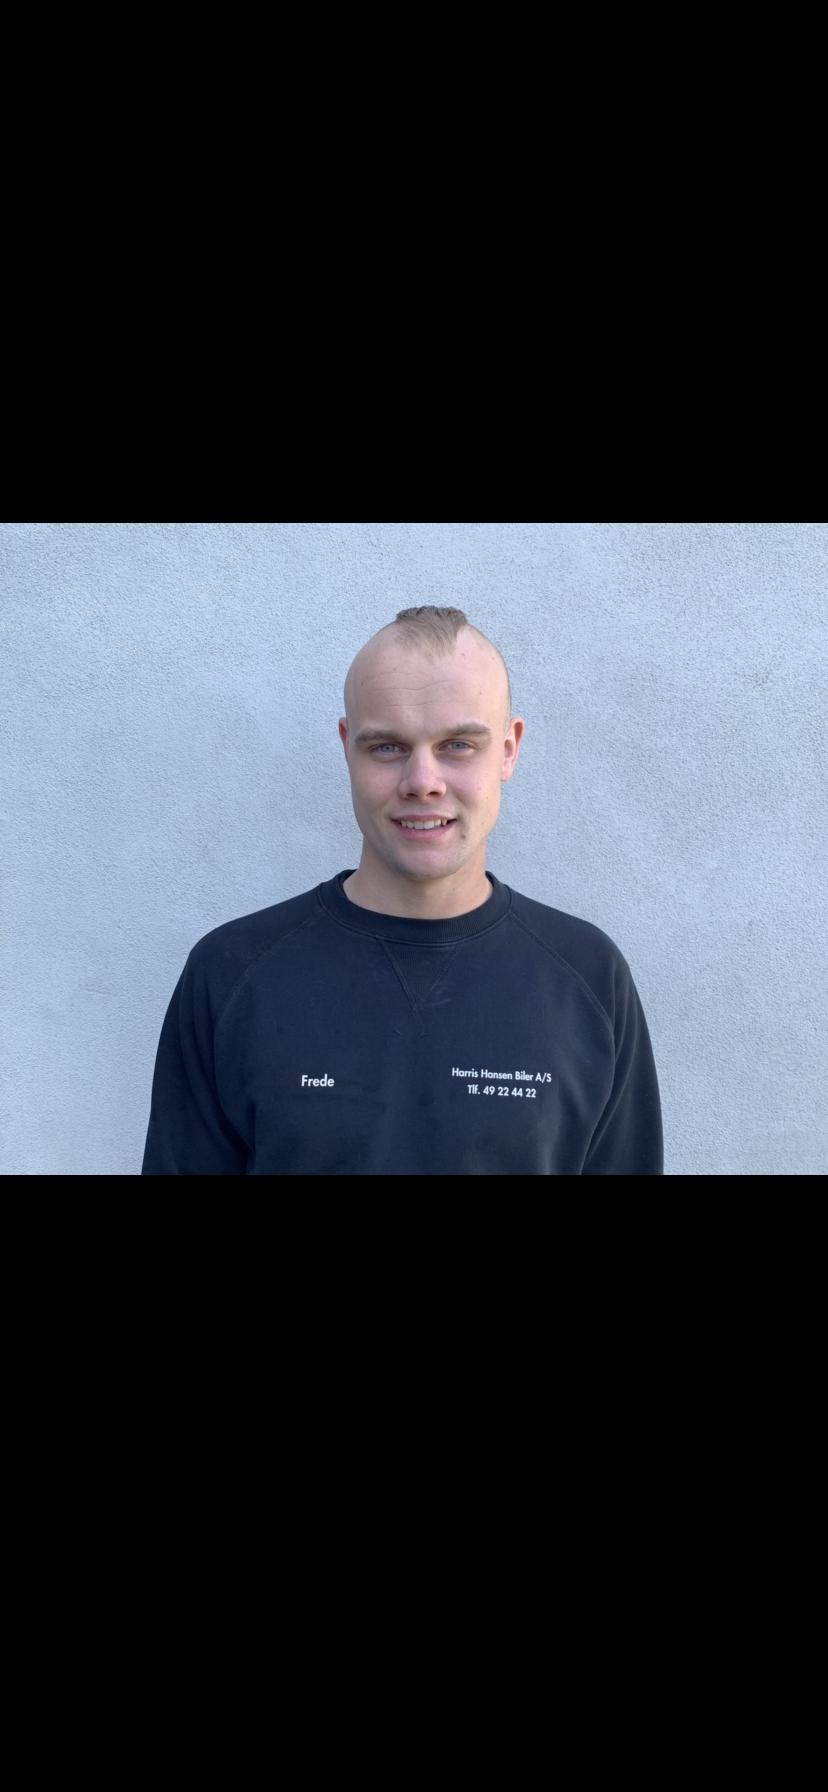 Frede Sørensen